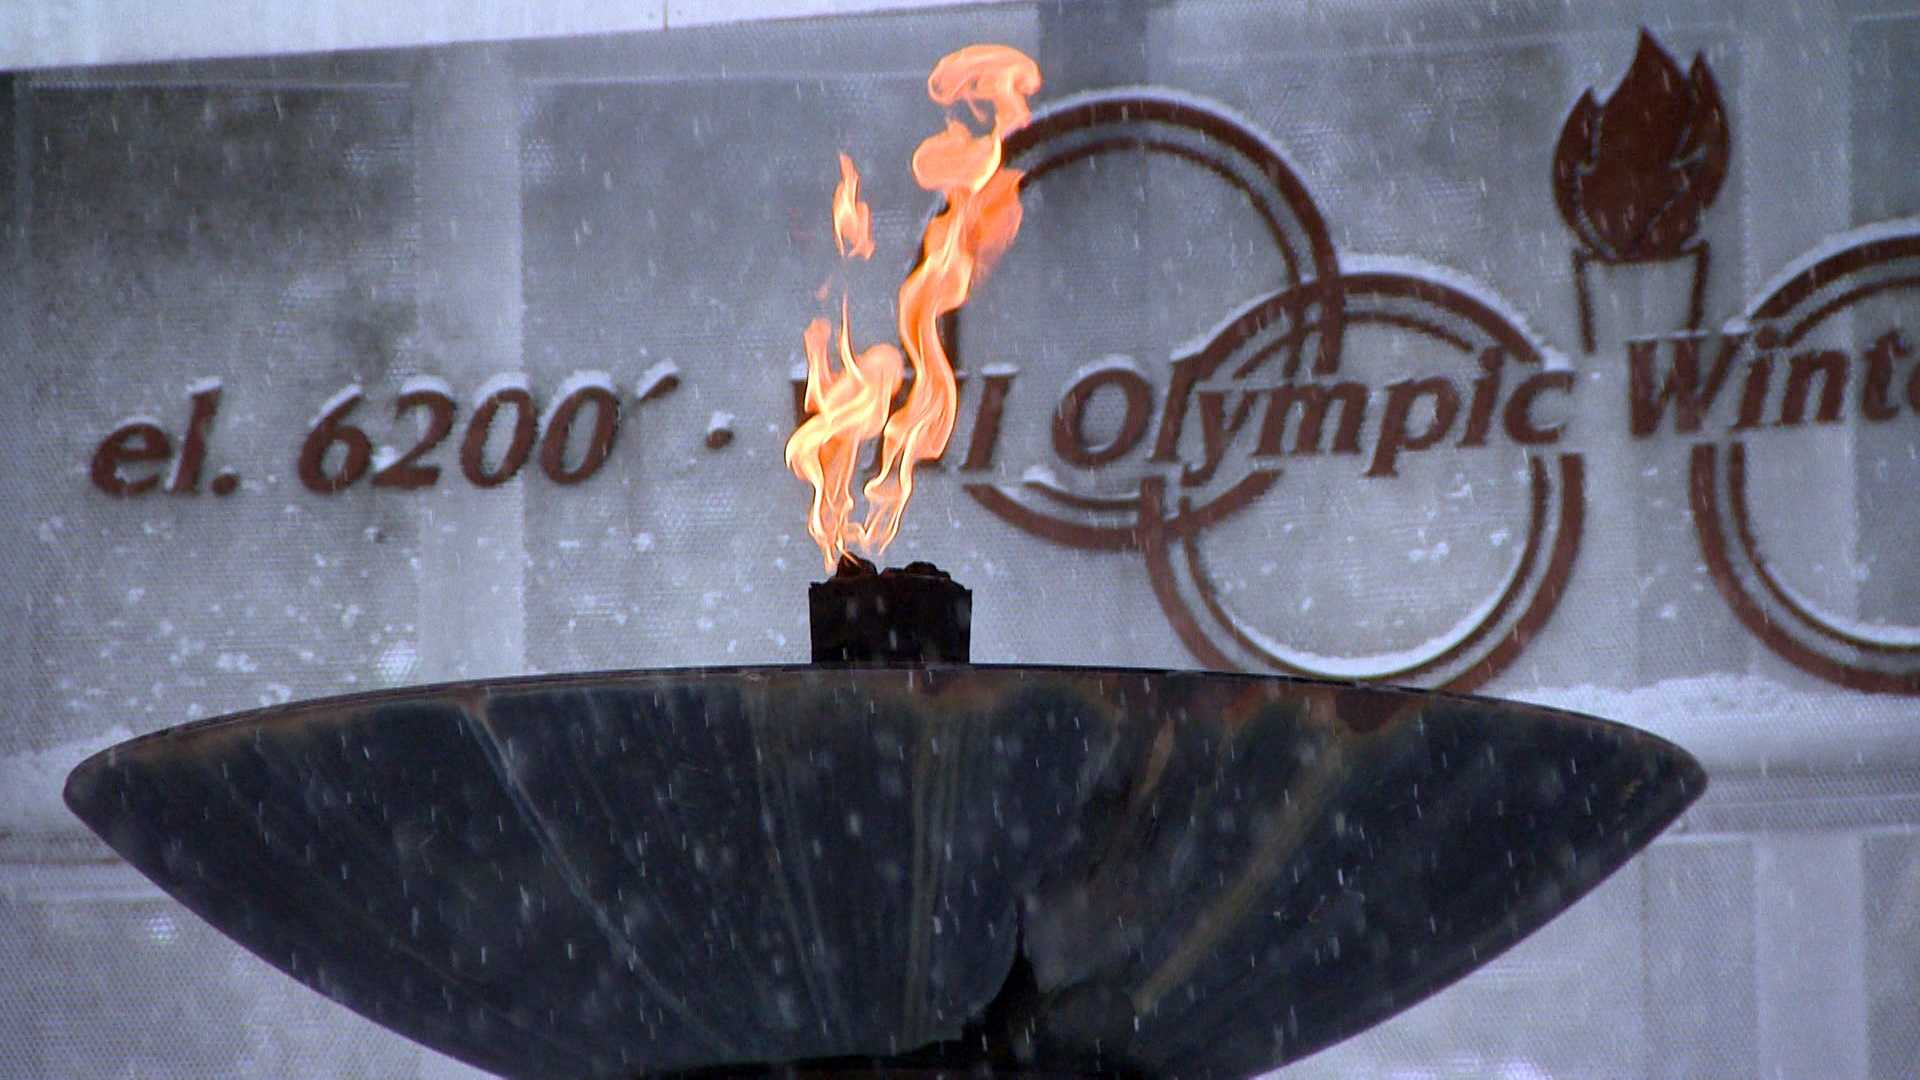 squaw valley olympics